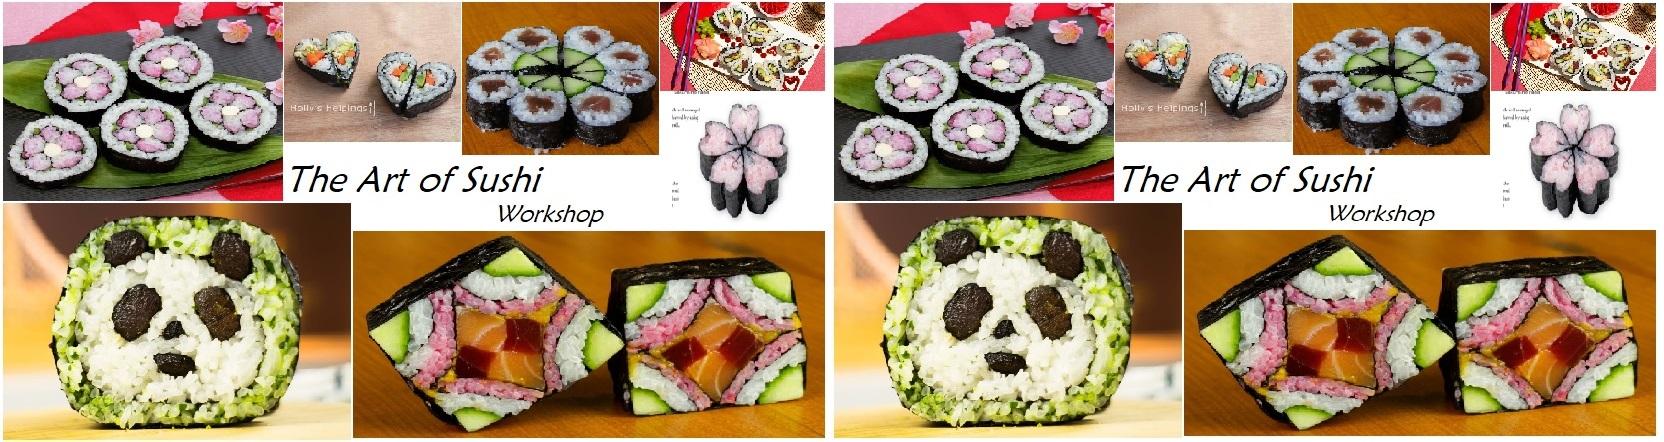 The Art of Sushi Workshop